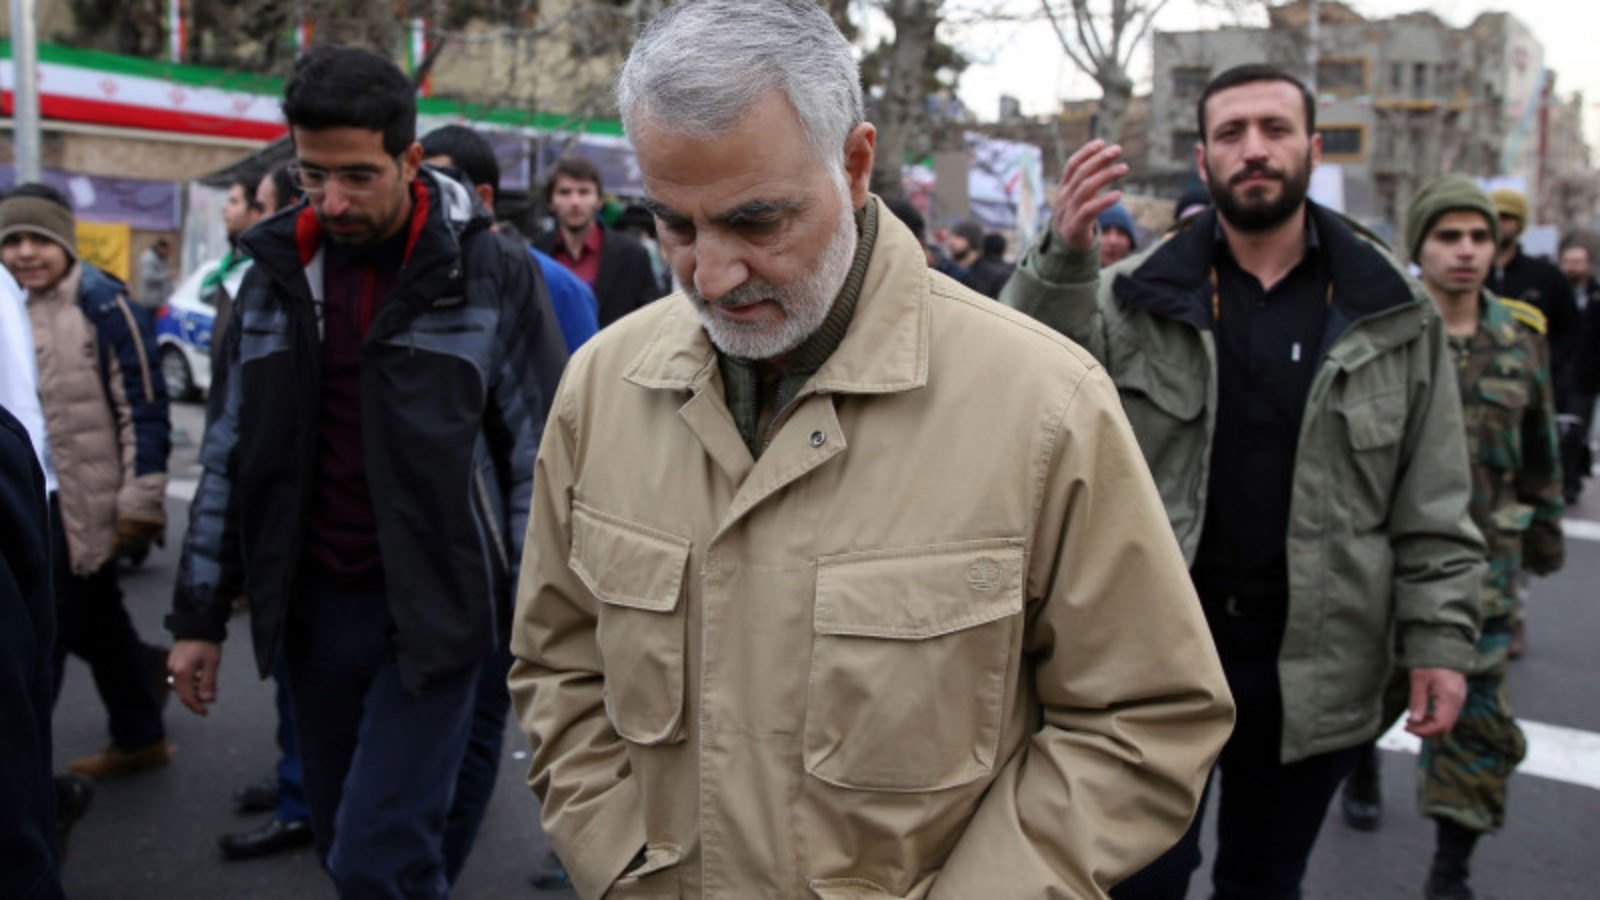 Qassem Suleimani, center, attends celebrations marking the 37th anniversary of the Islamic revolution in Tehran.